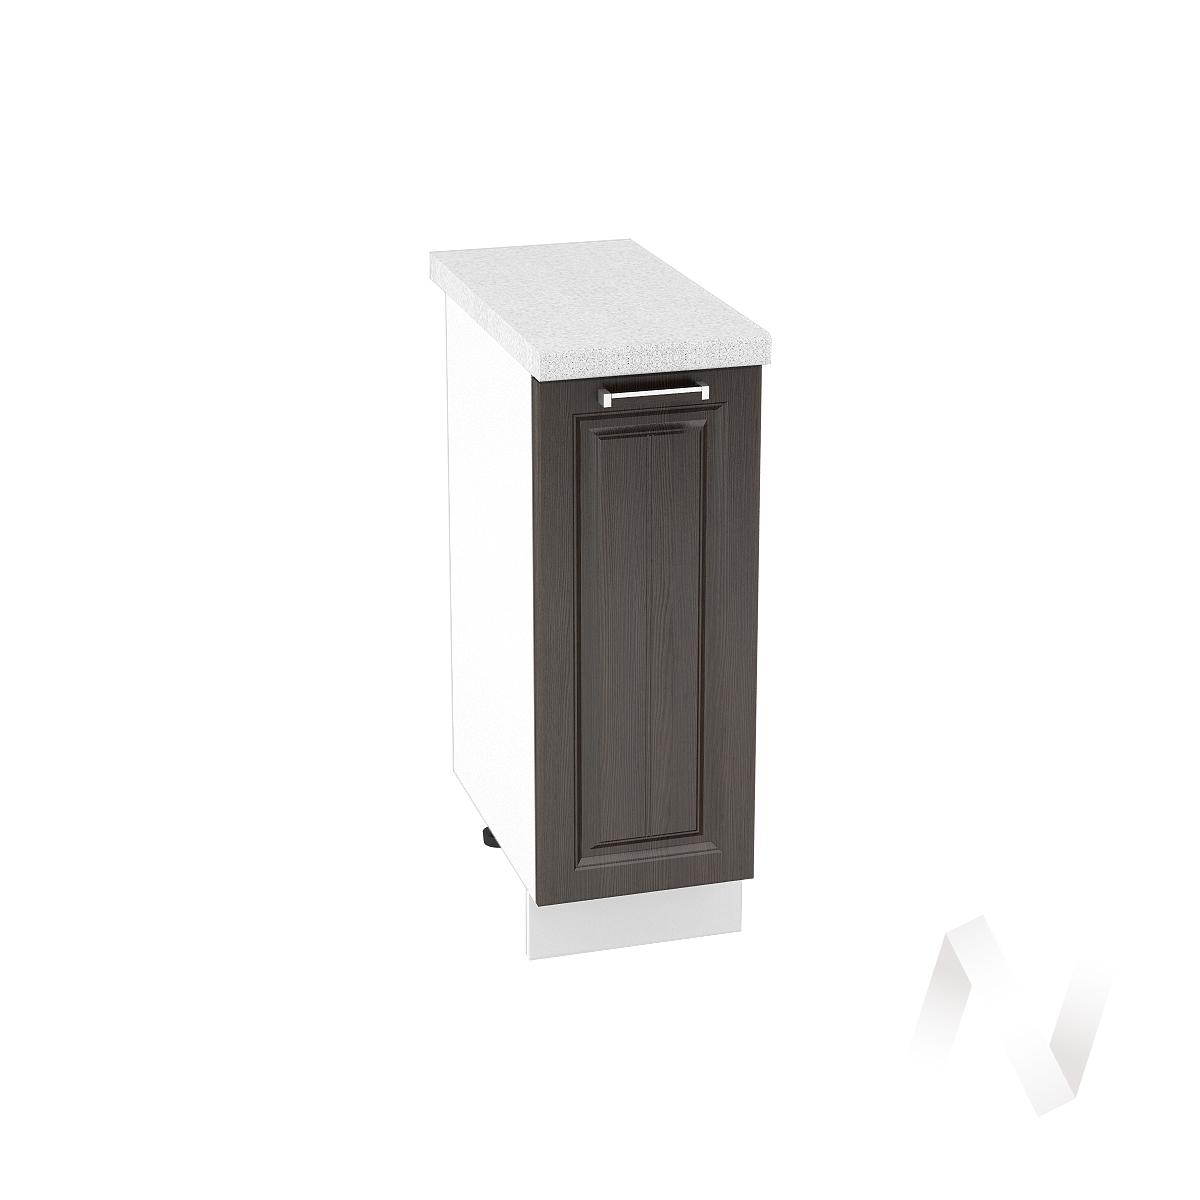 "Кухня ""Прага"": Шкаф нижний 300, ШН 300 (венге/корпус белый)"